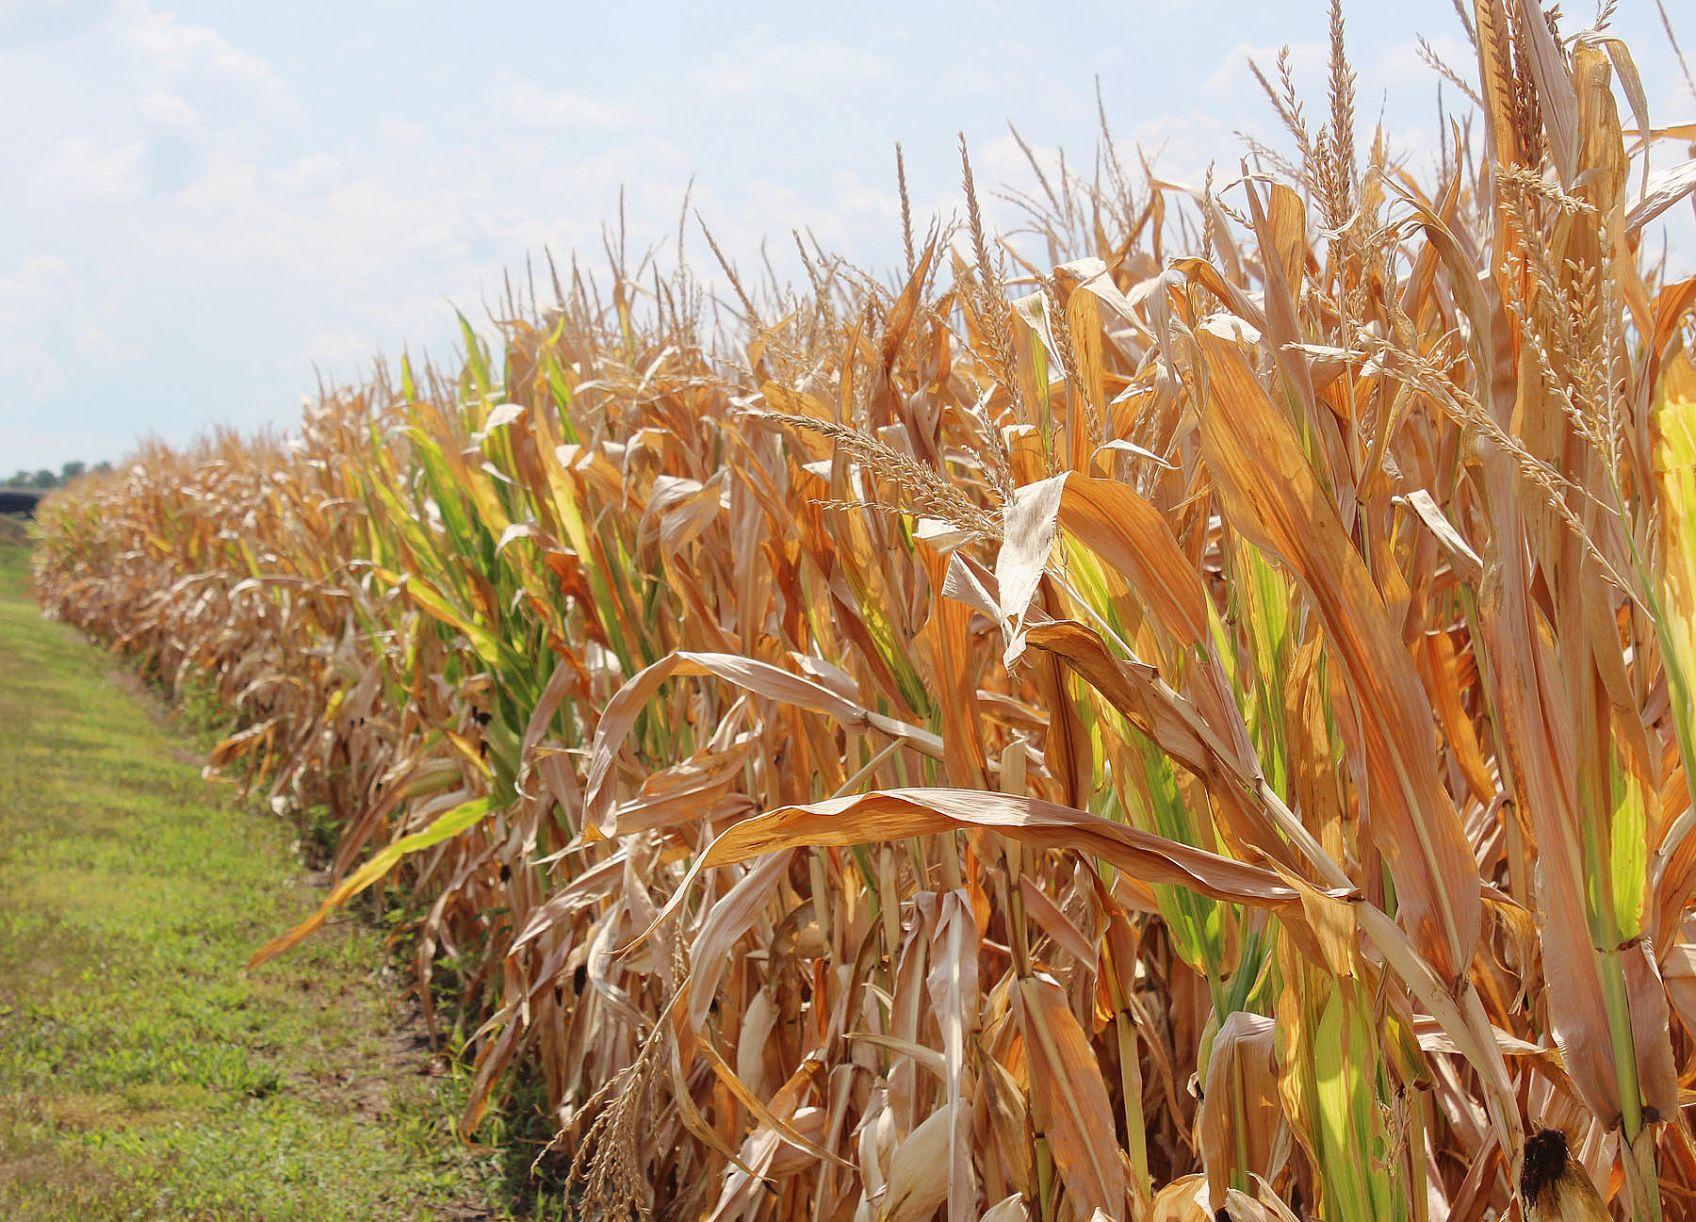 Local corn crop struggles through drought and